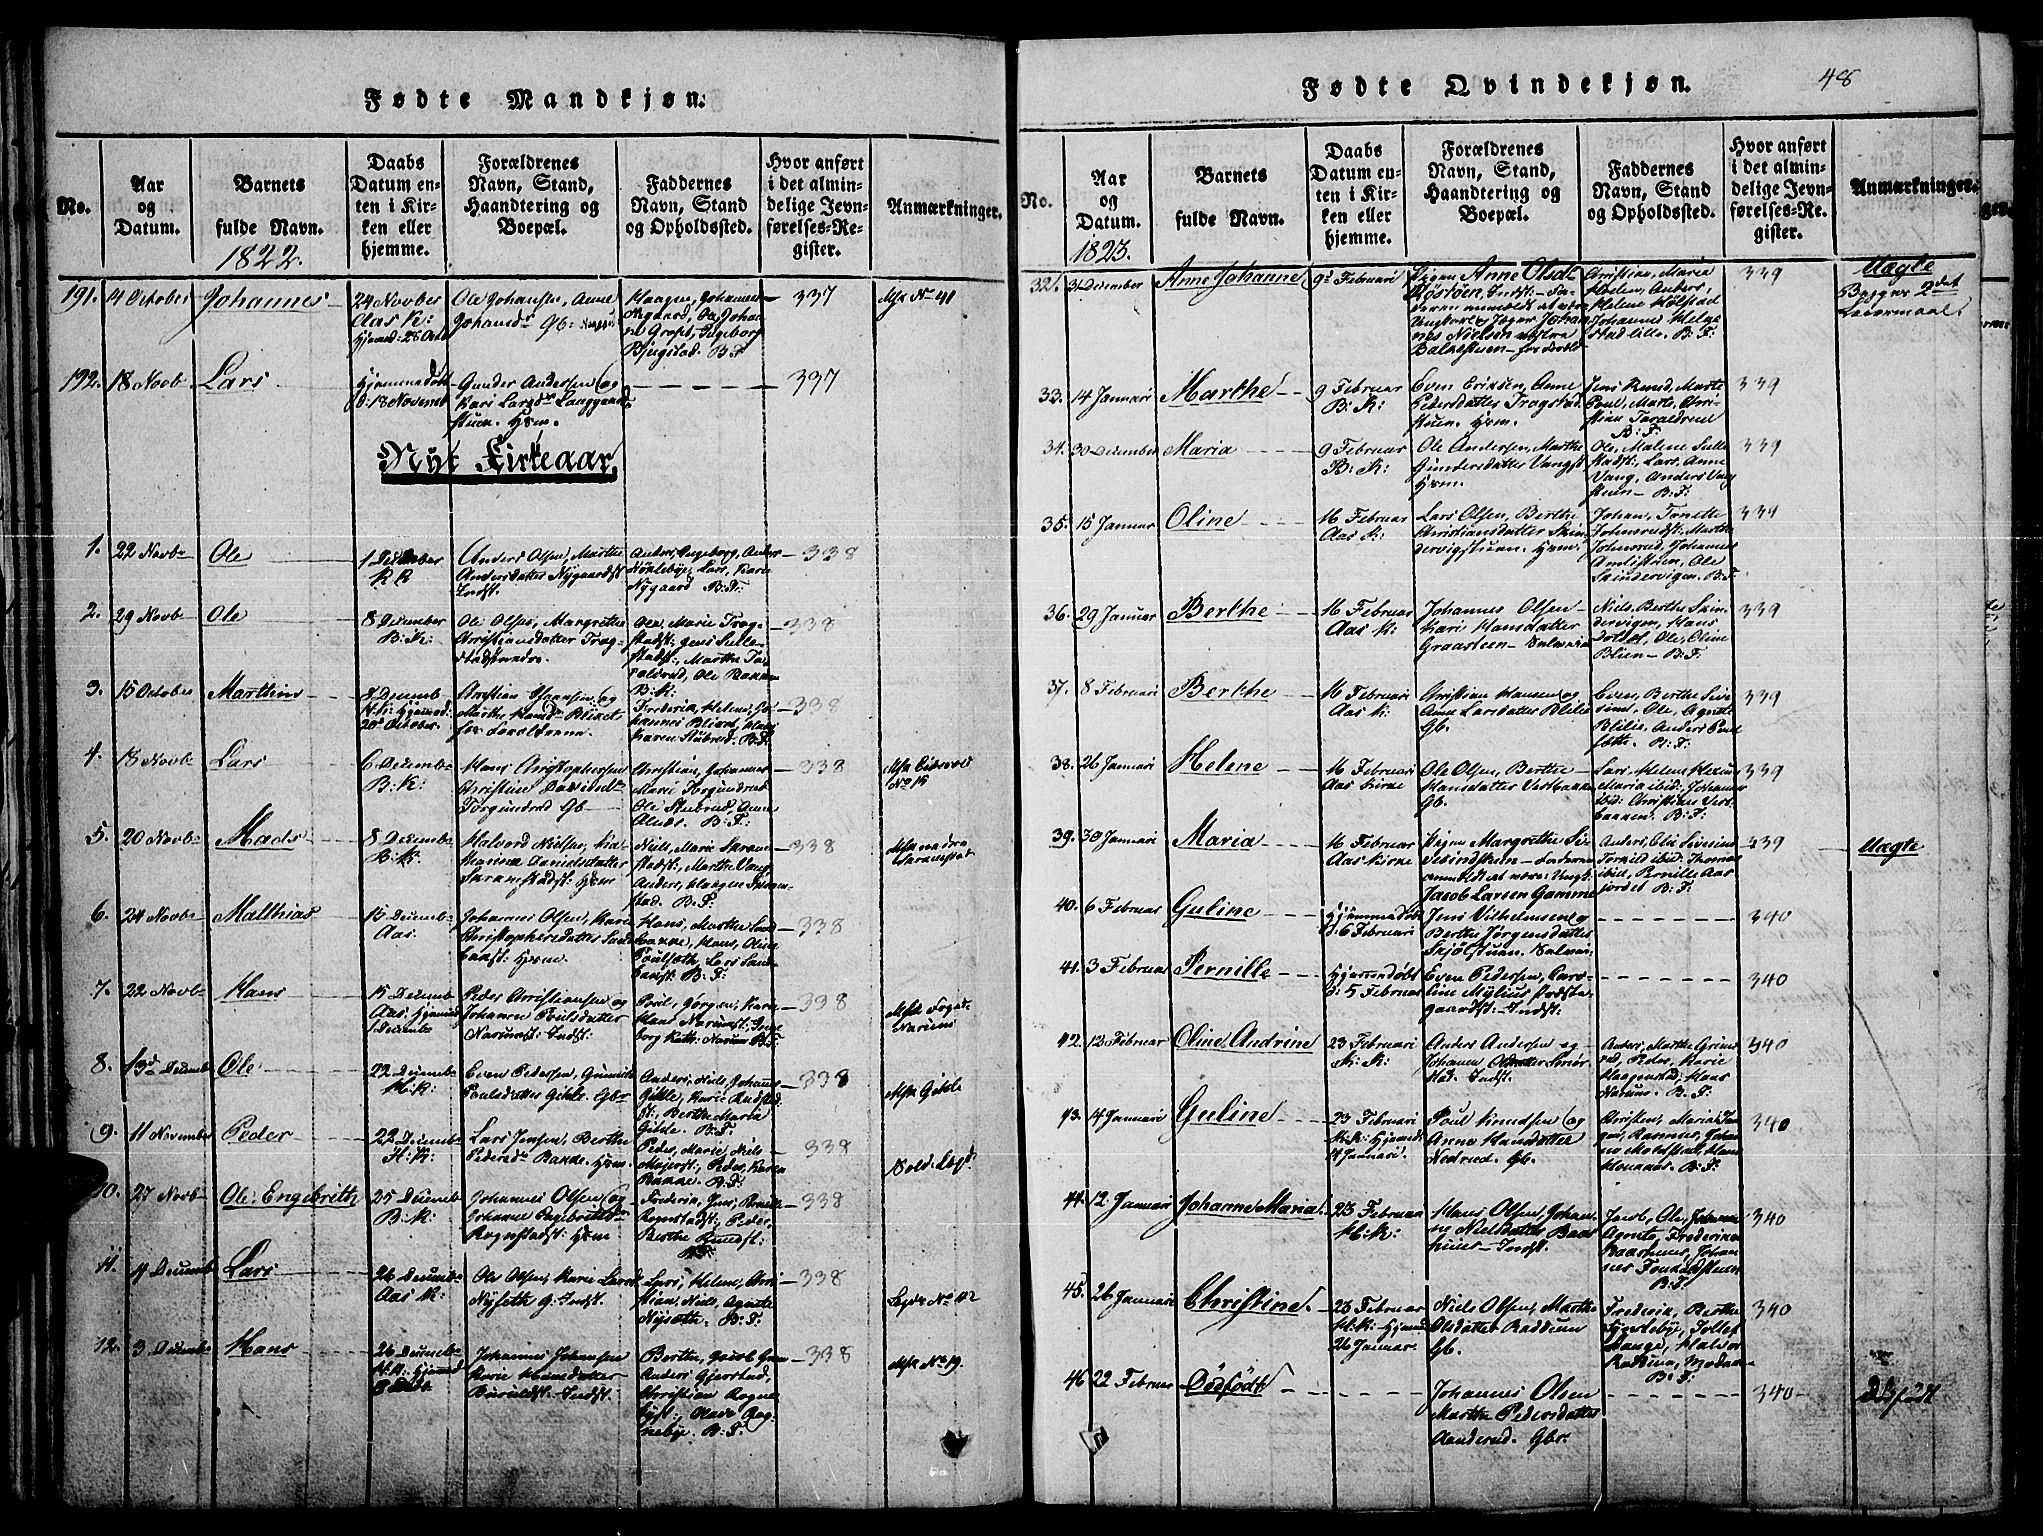 SAH, Toten prestekontor, Ministerialbok nr. 10, 1820-1828, s. 48